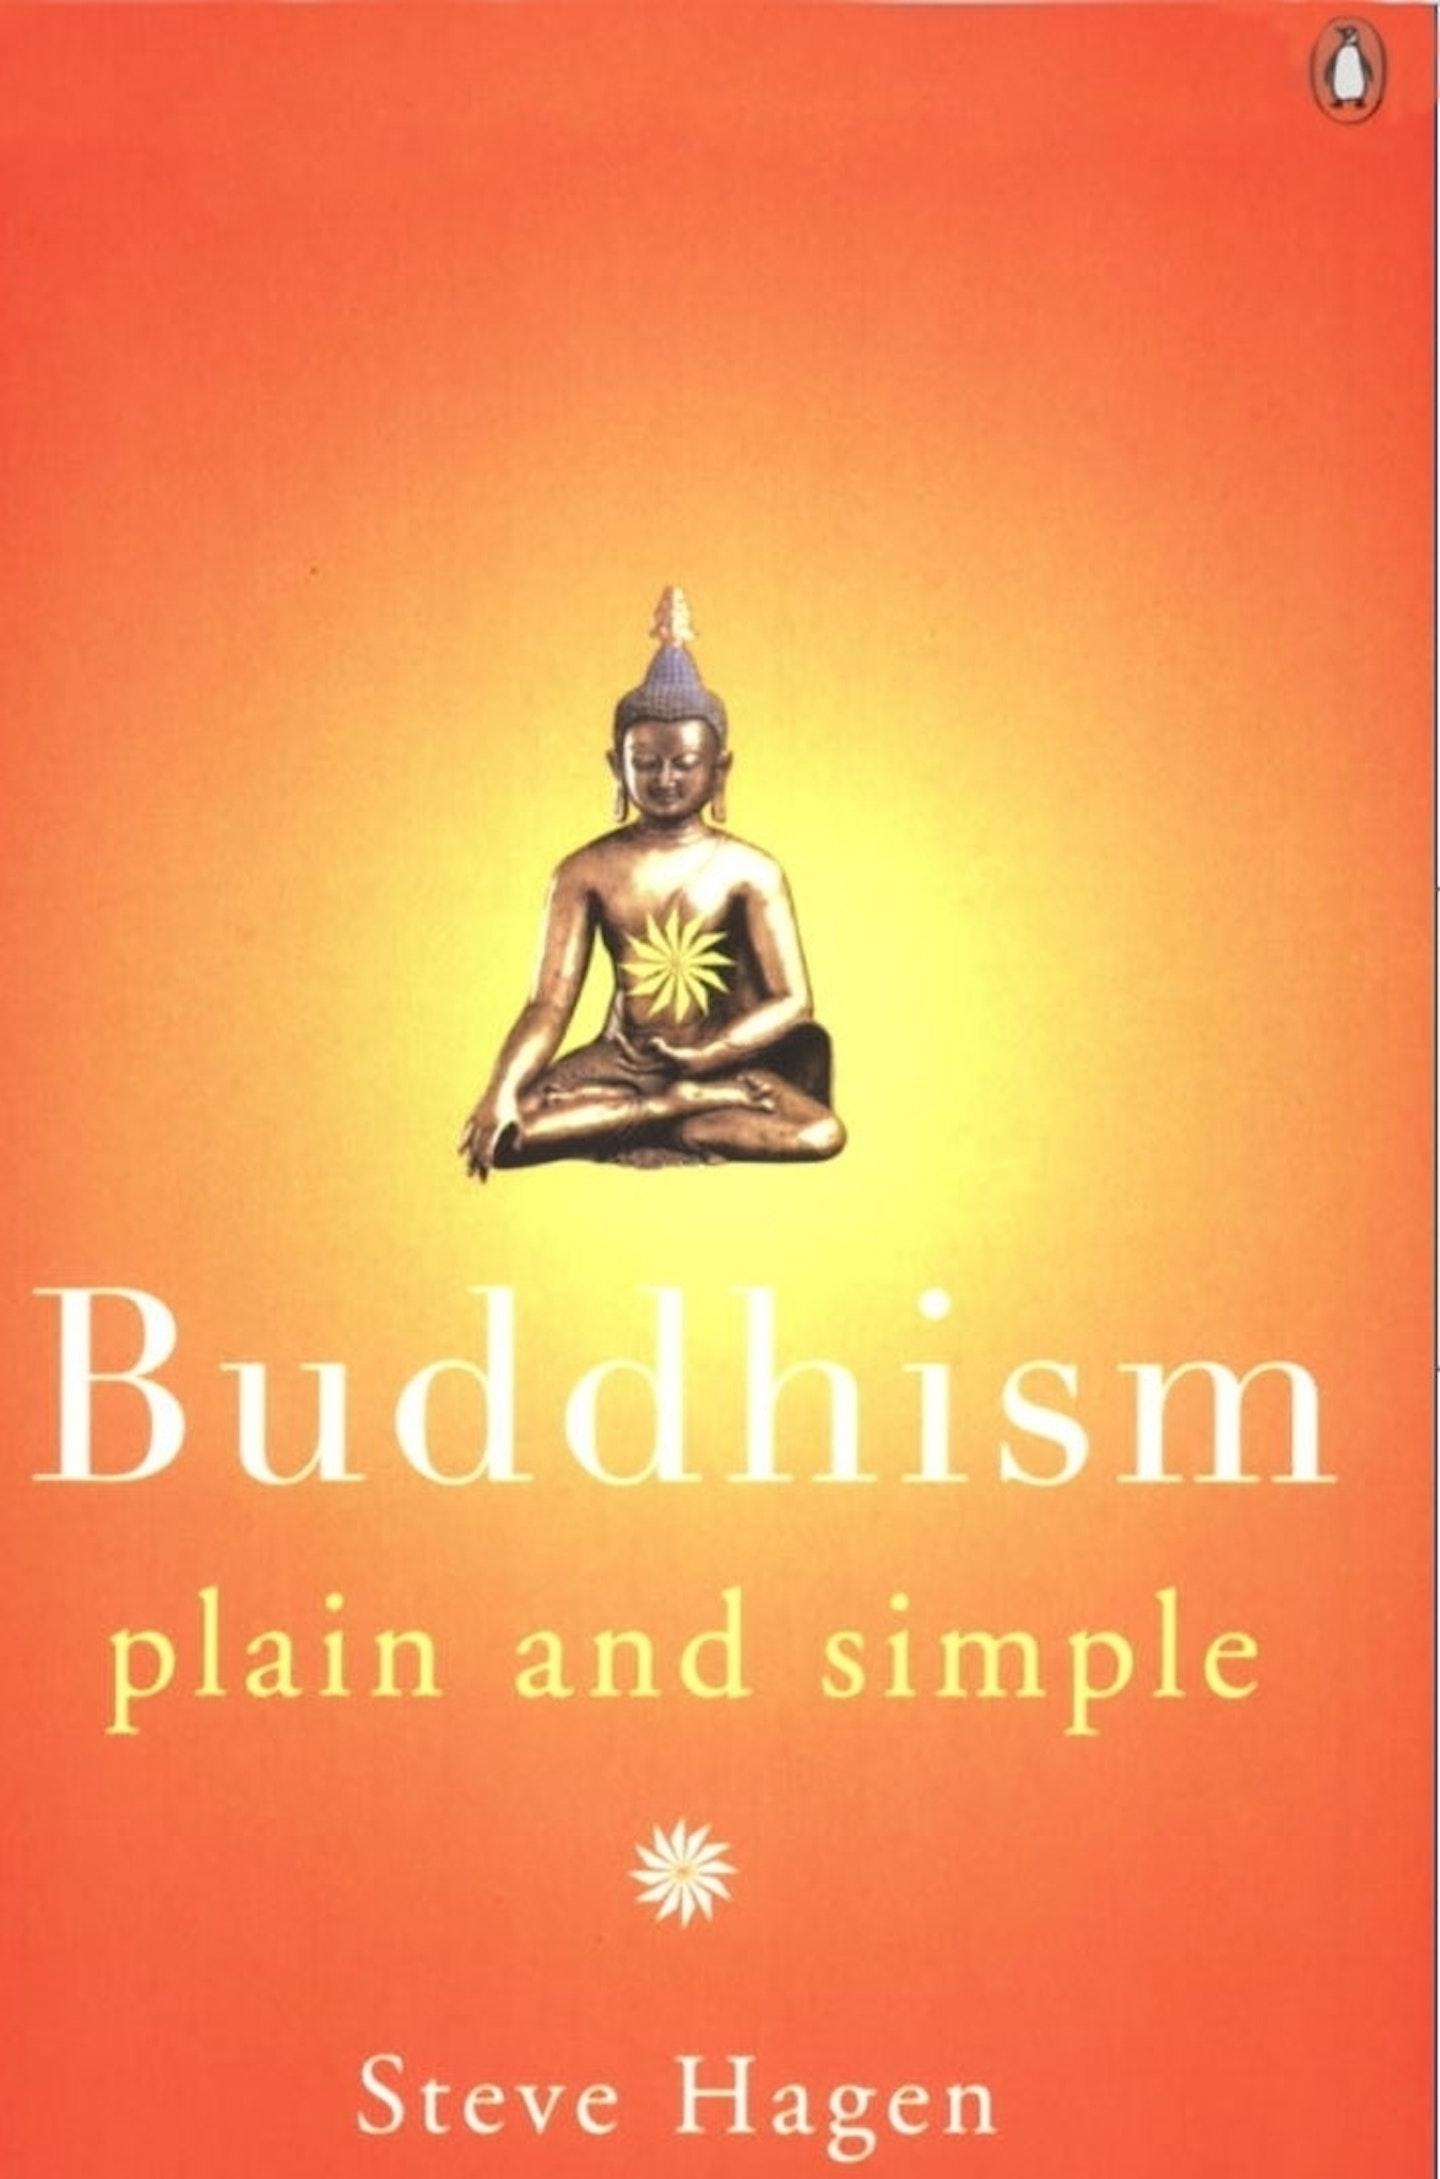 Simple Book Cover Zwart : Buddhism plain and simple penguin books australia